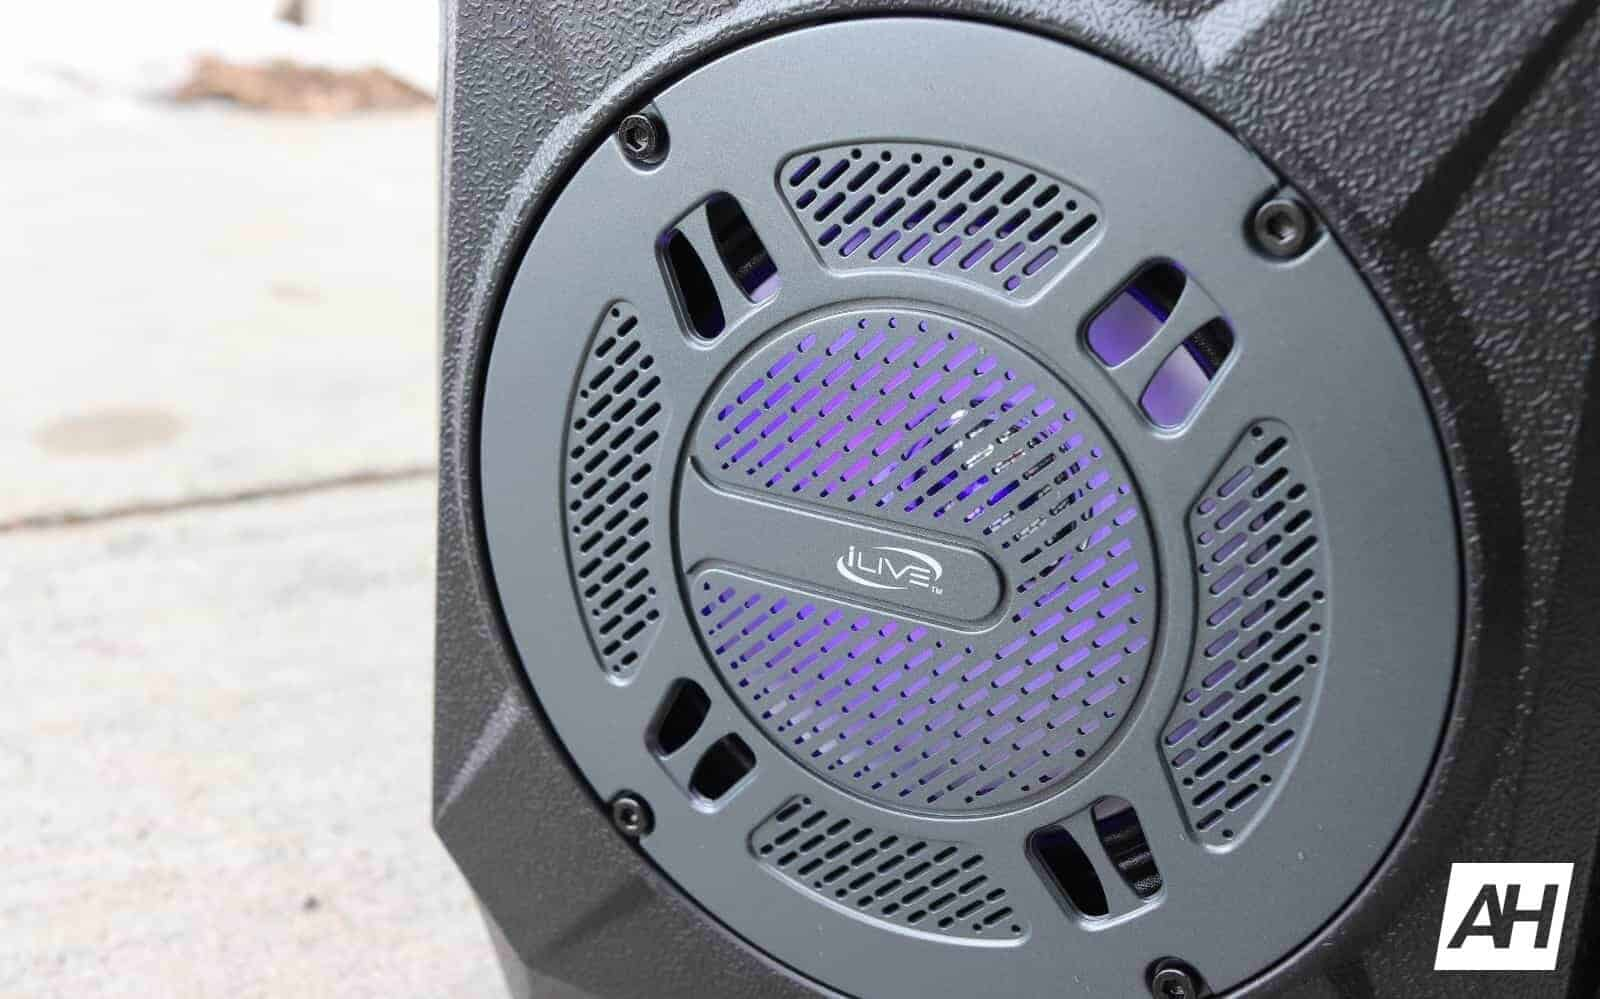 iLive Wireless Tailgate Speaker HARDWARE AH 2019 GLLRY 01